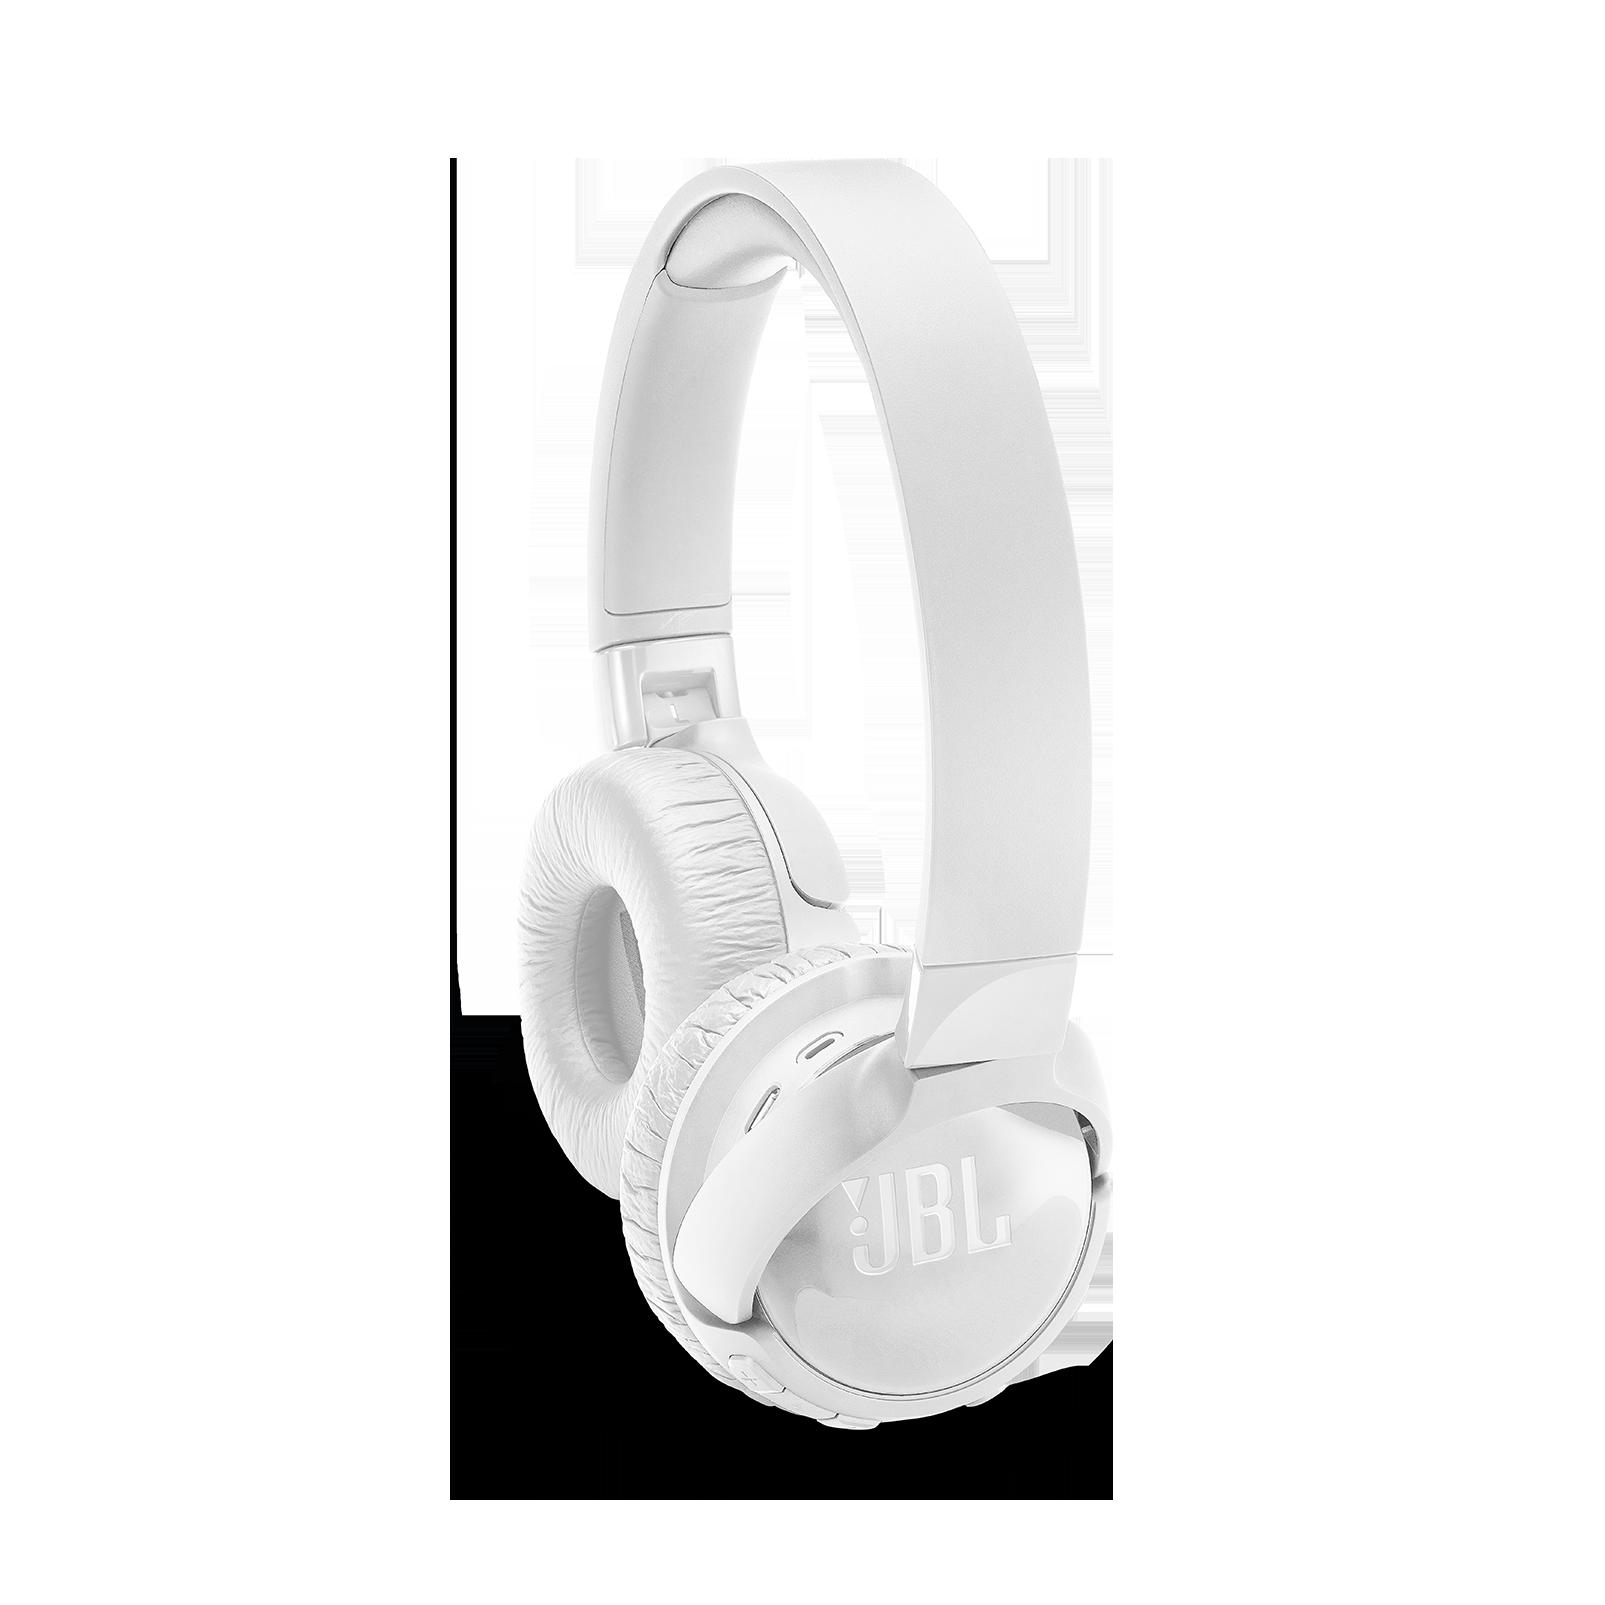 JBL TUNE 600BTNC - White - Wireless, on-ear, active noise-cancelling headphones. - Detailshot 1